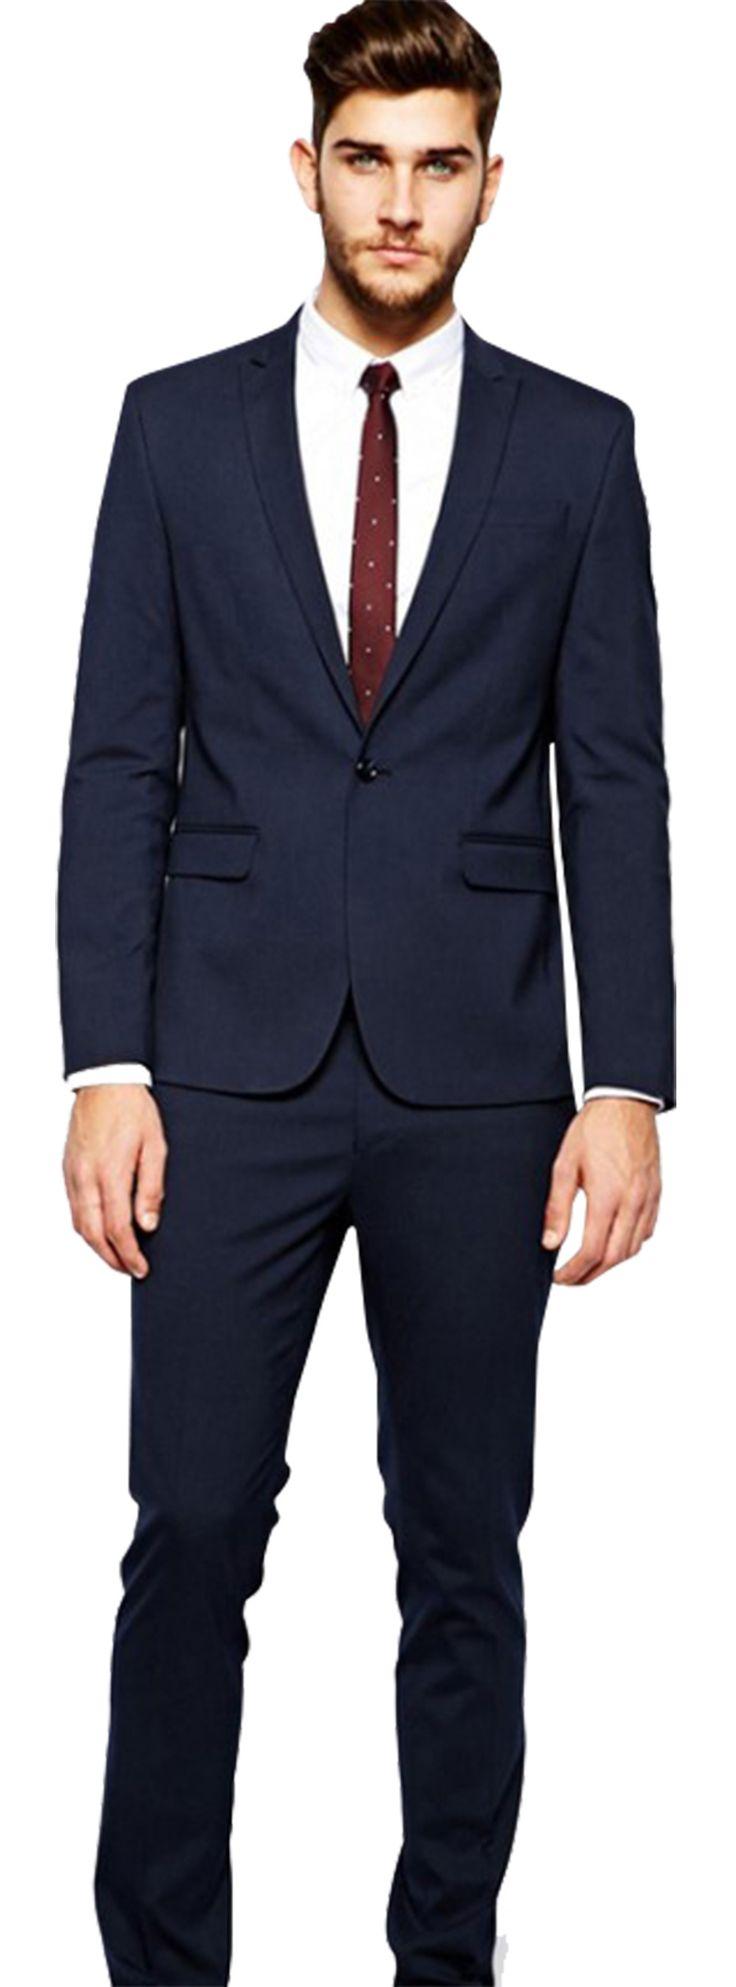 Navy Blue Suit Formal